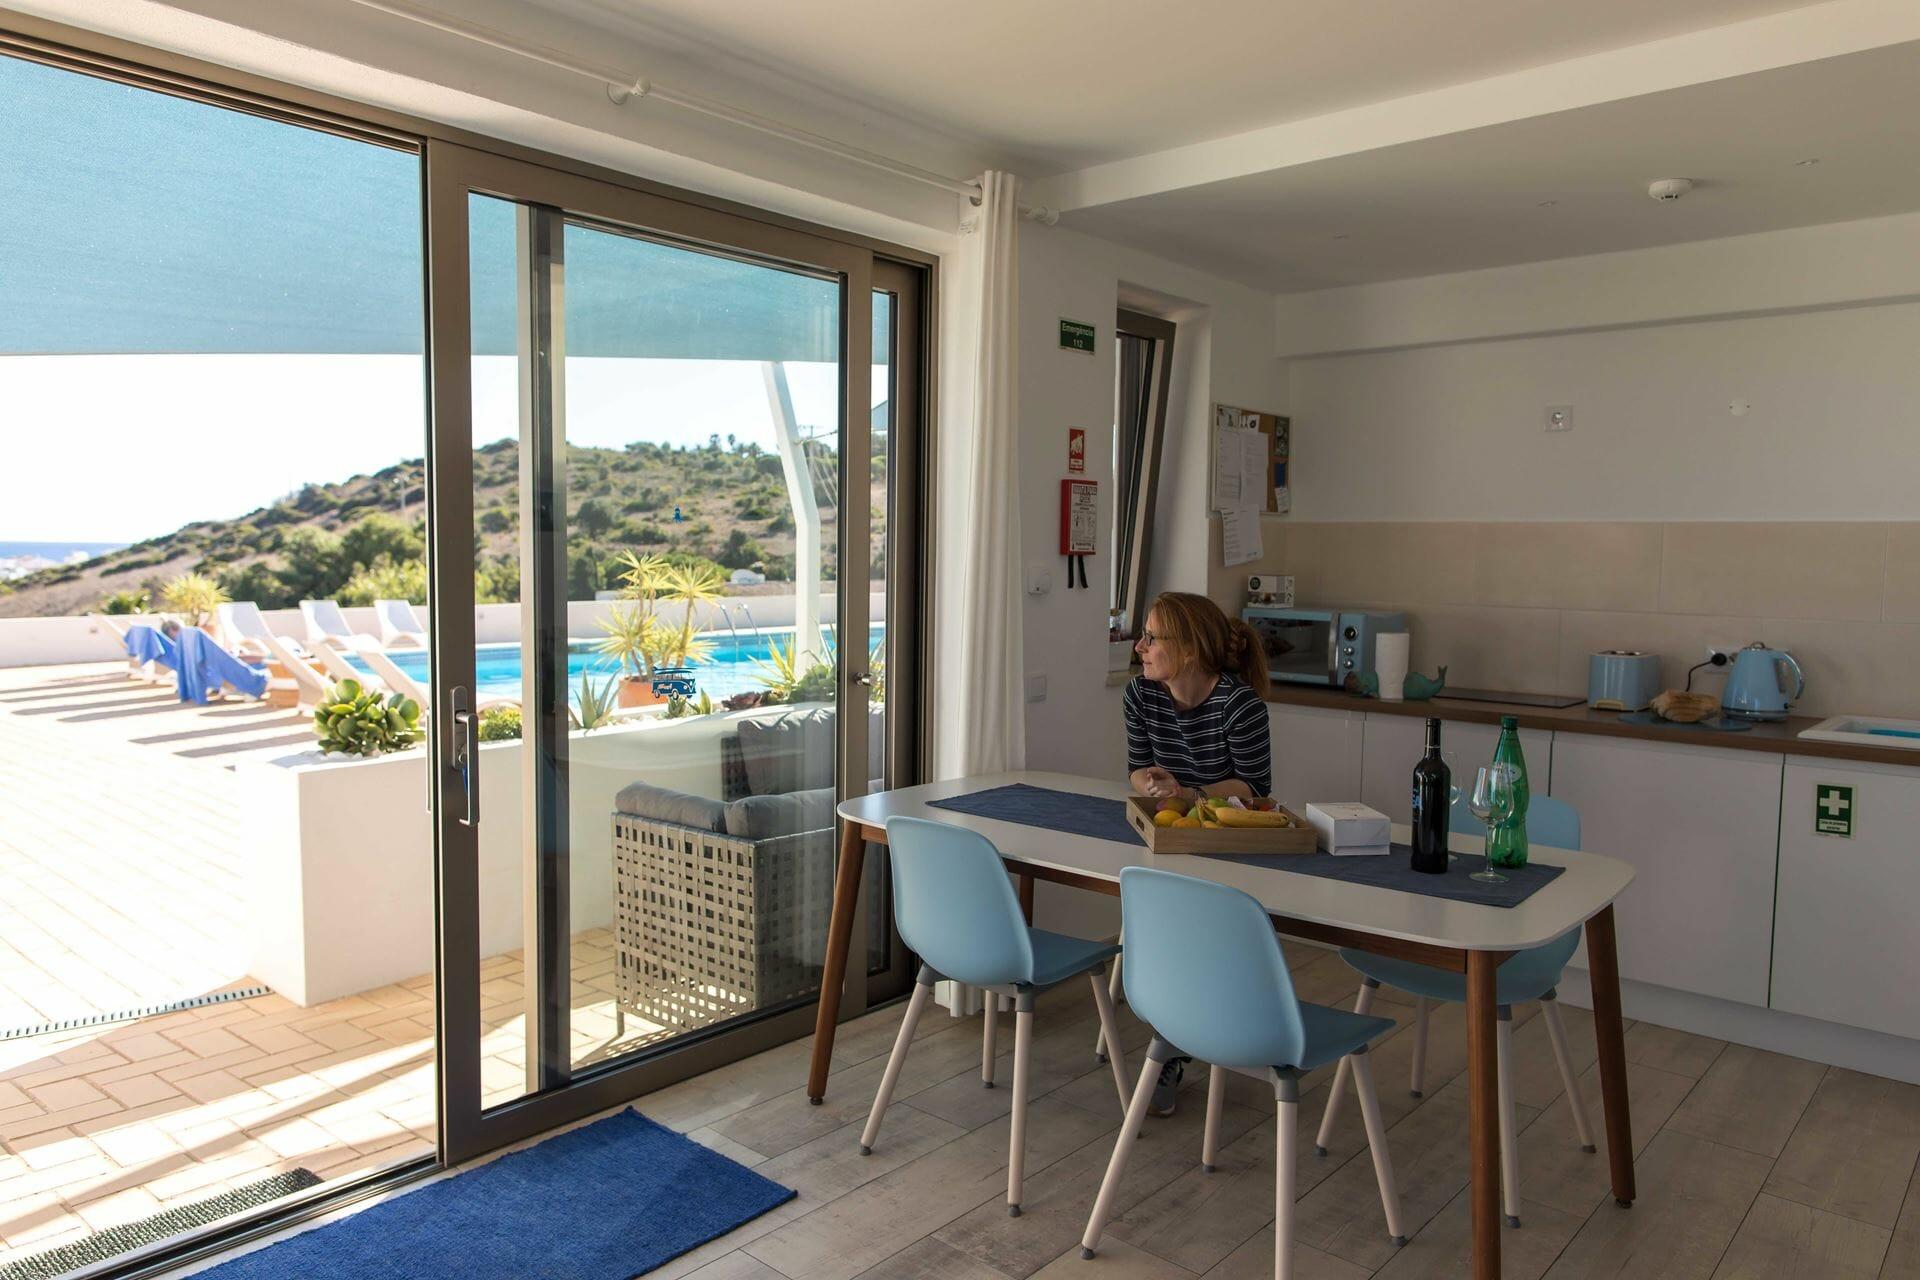 Oceano 2 Bedroom Apartment (8) Ocean Blue Portugal Active Holidays Algarve